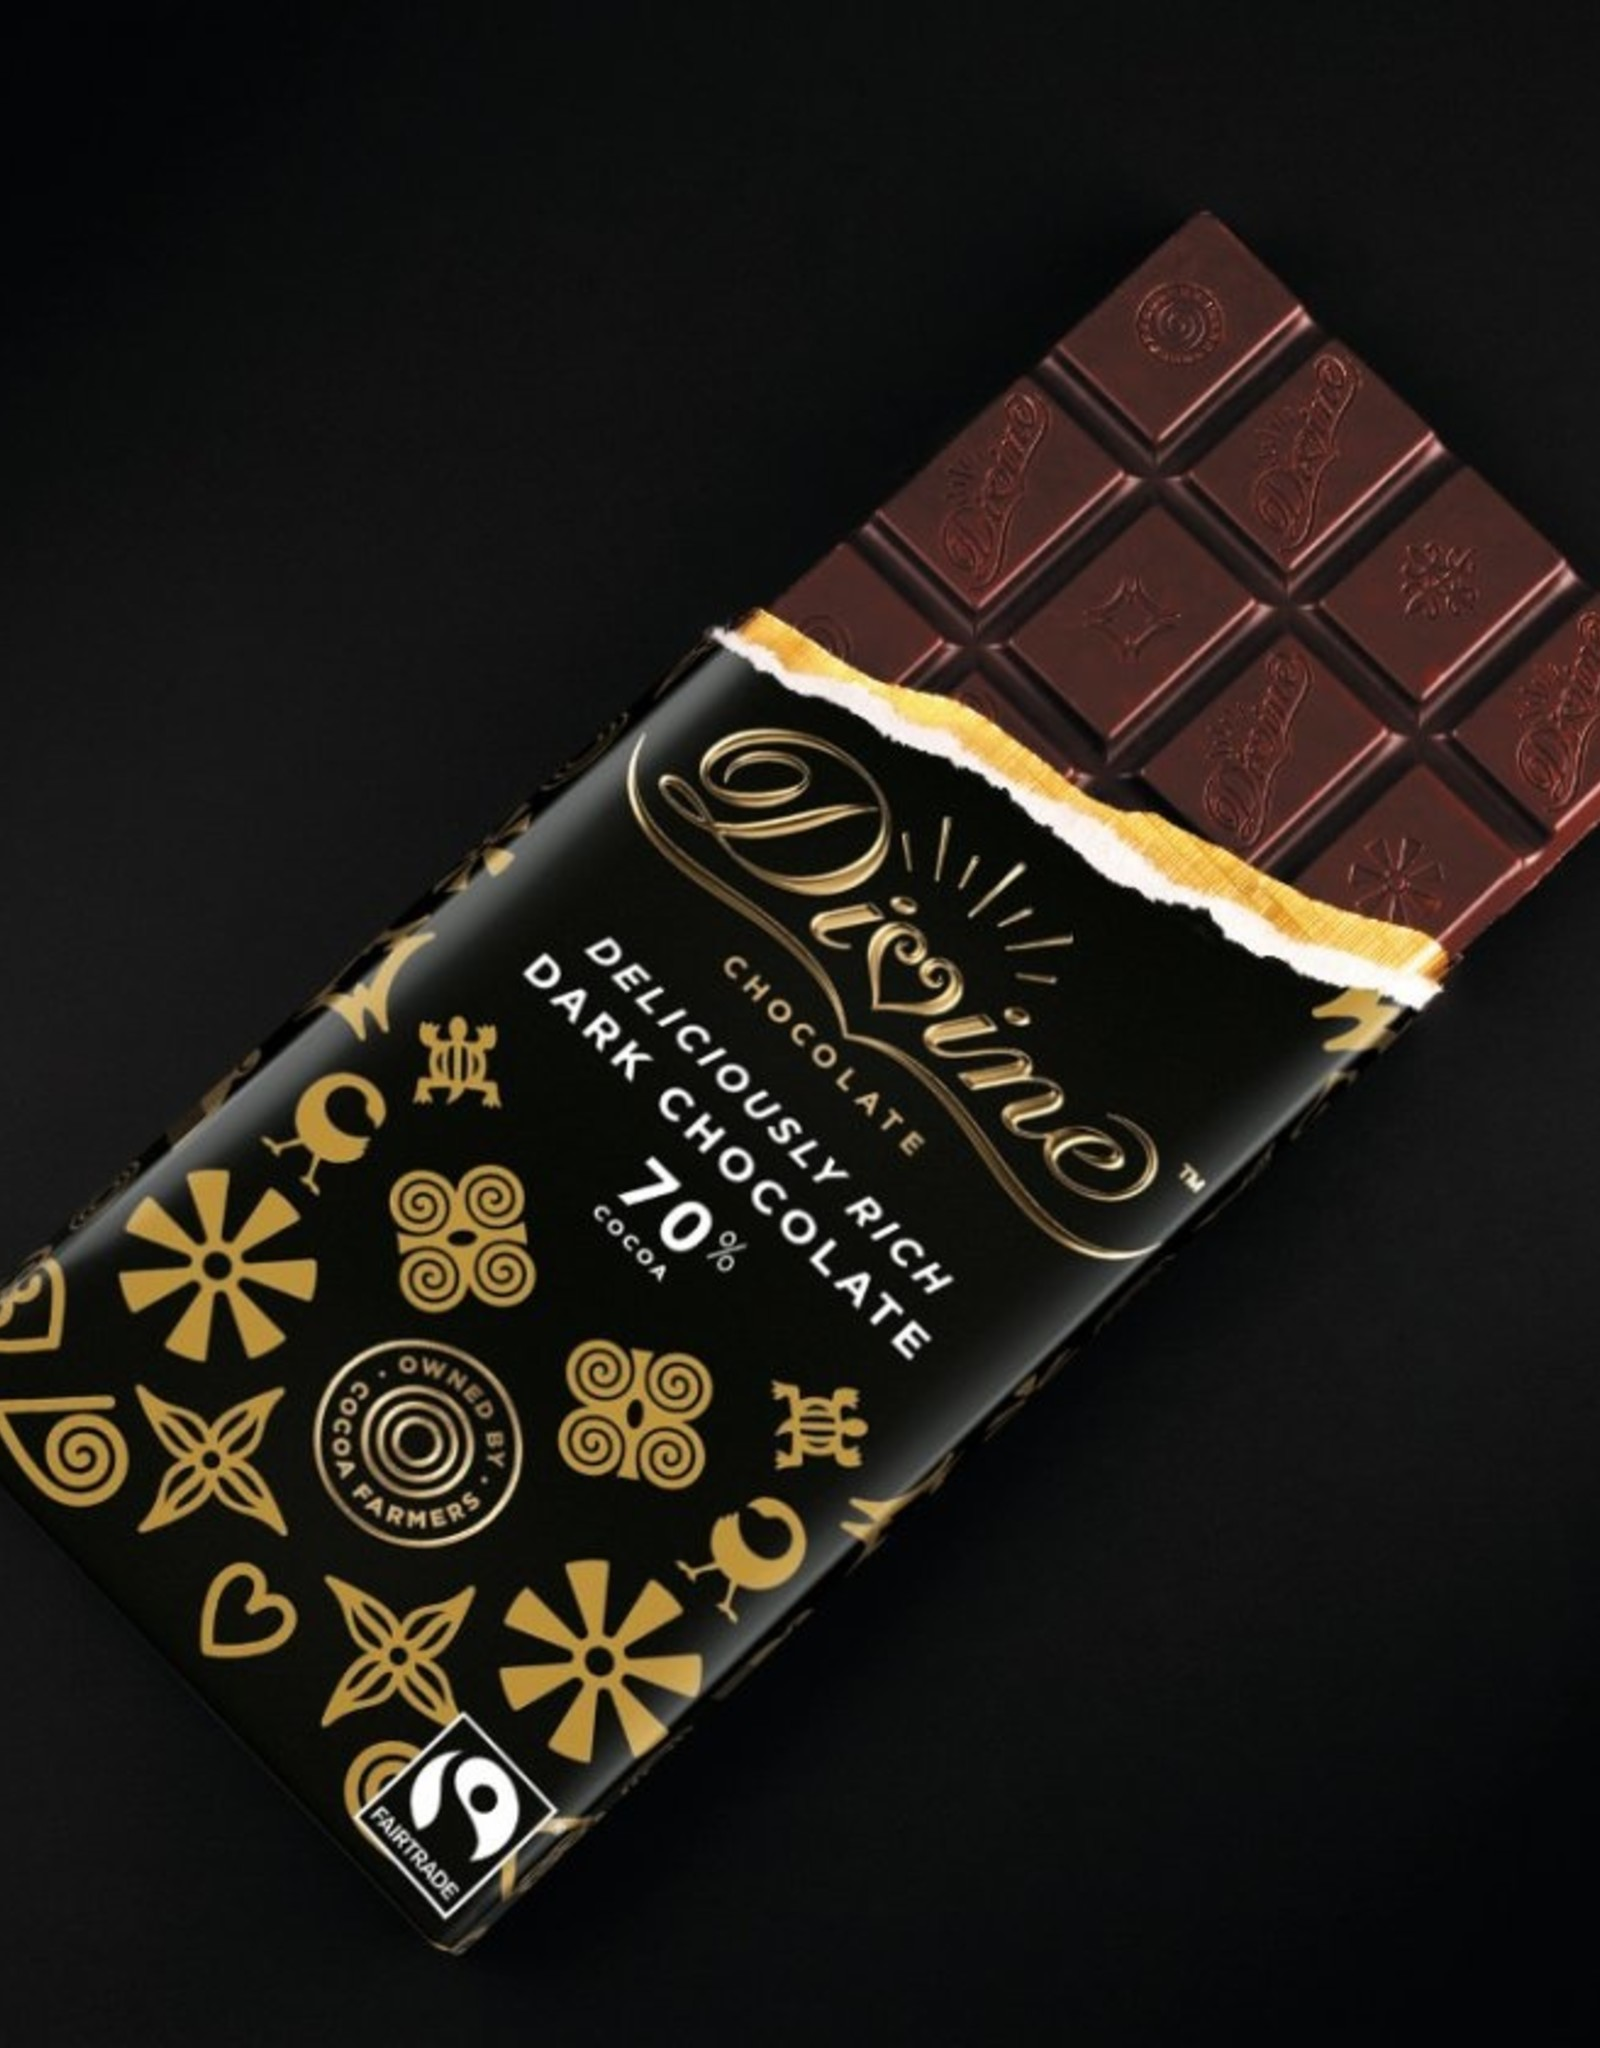 Divine - Dark Chocolate Bar 70% (85g)